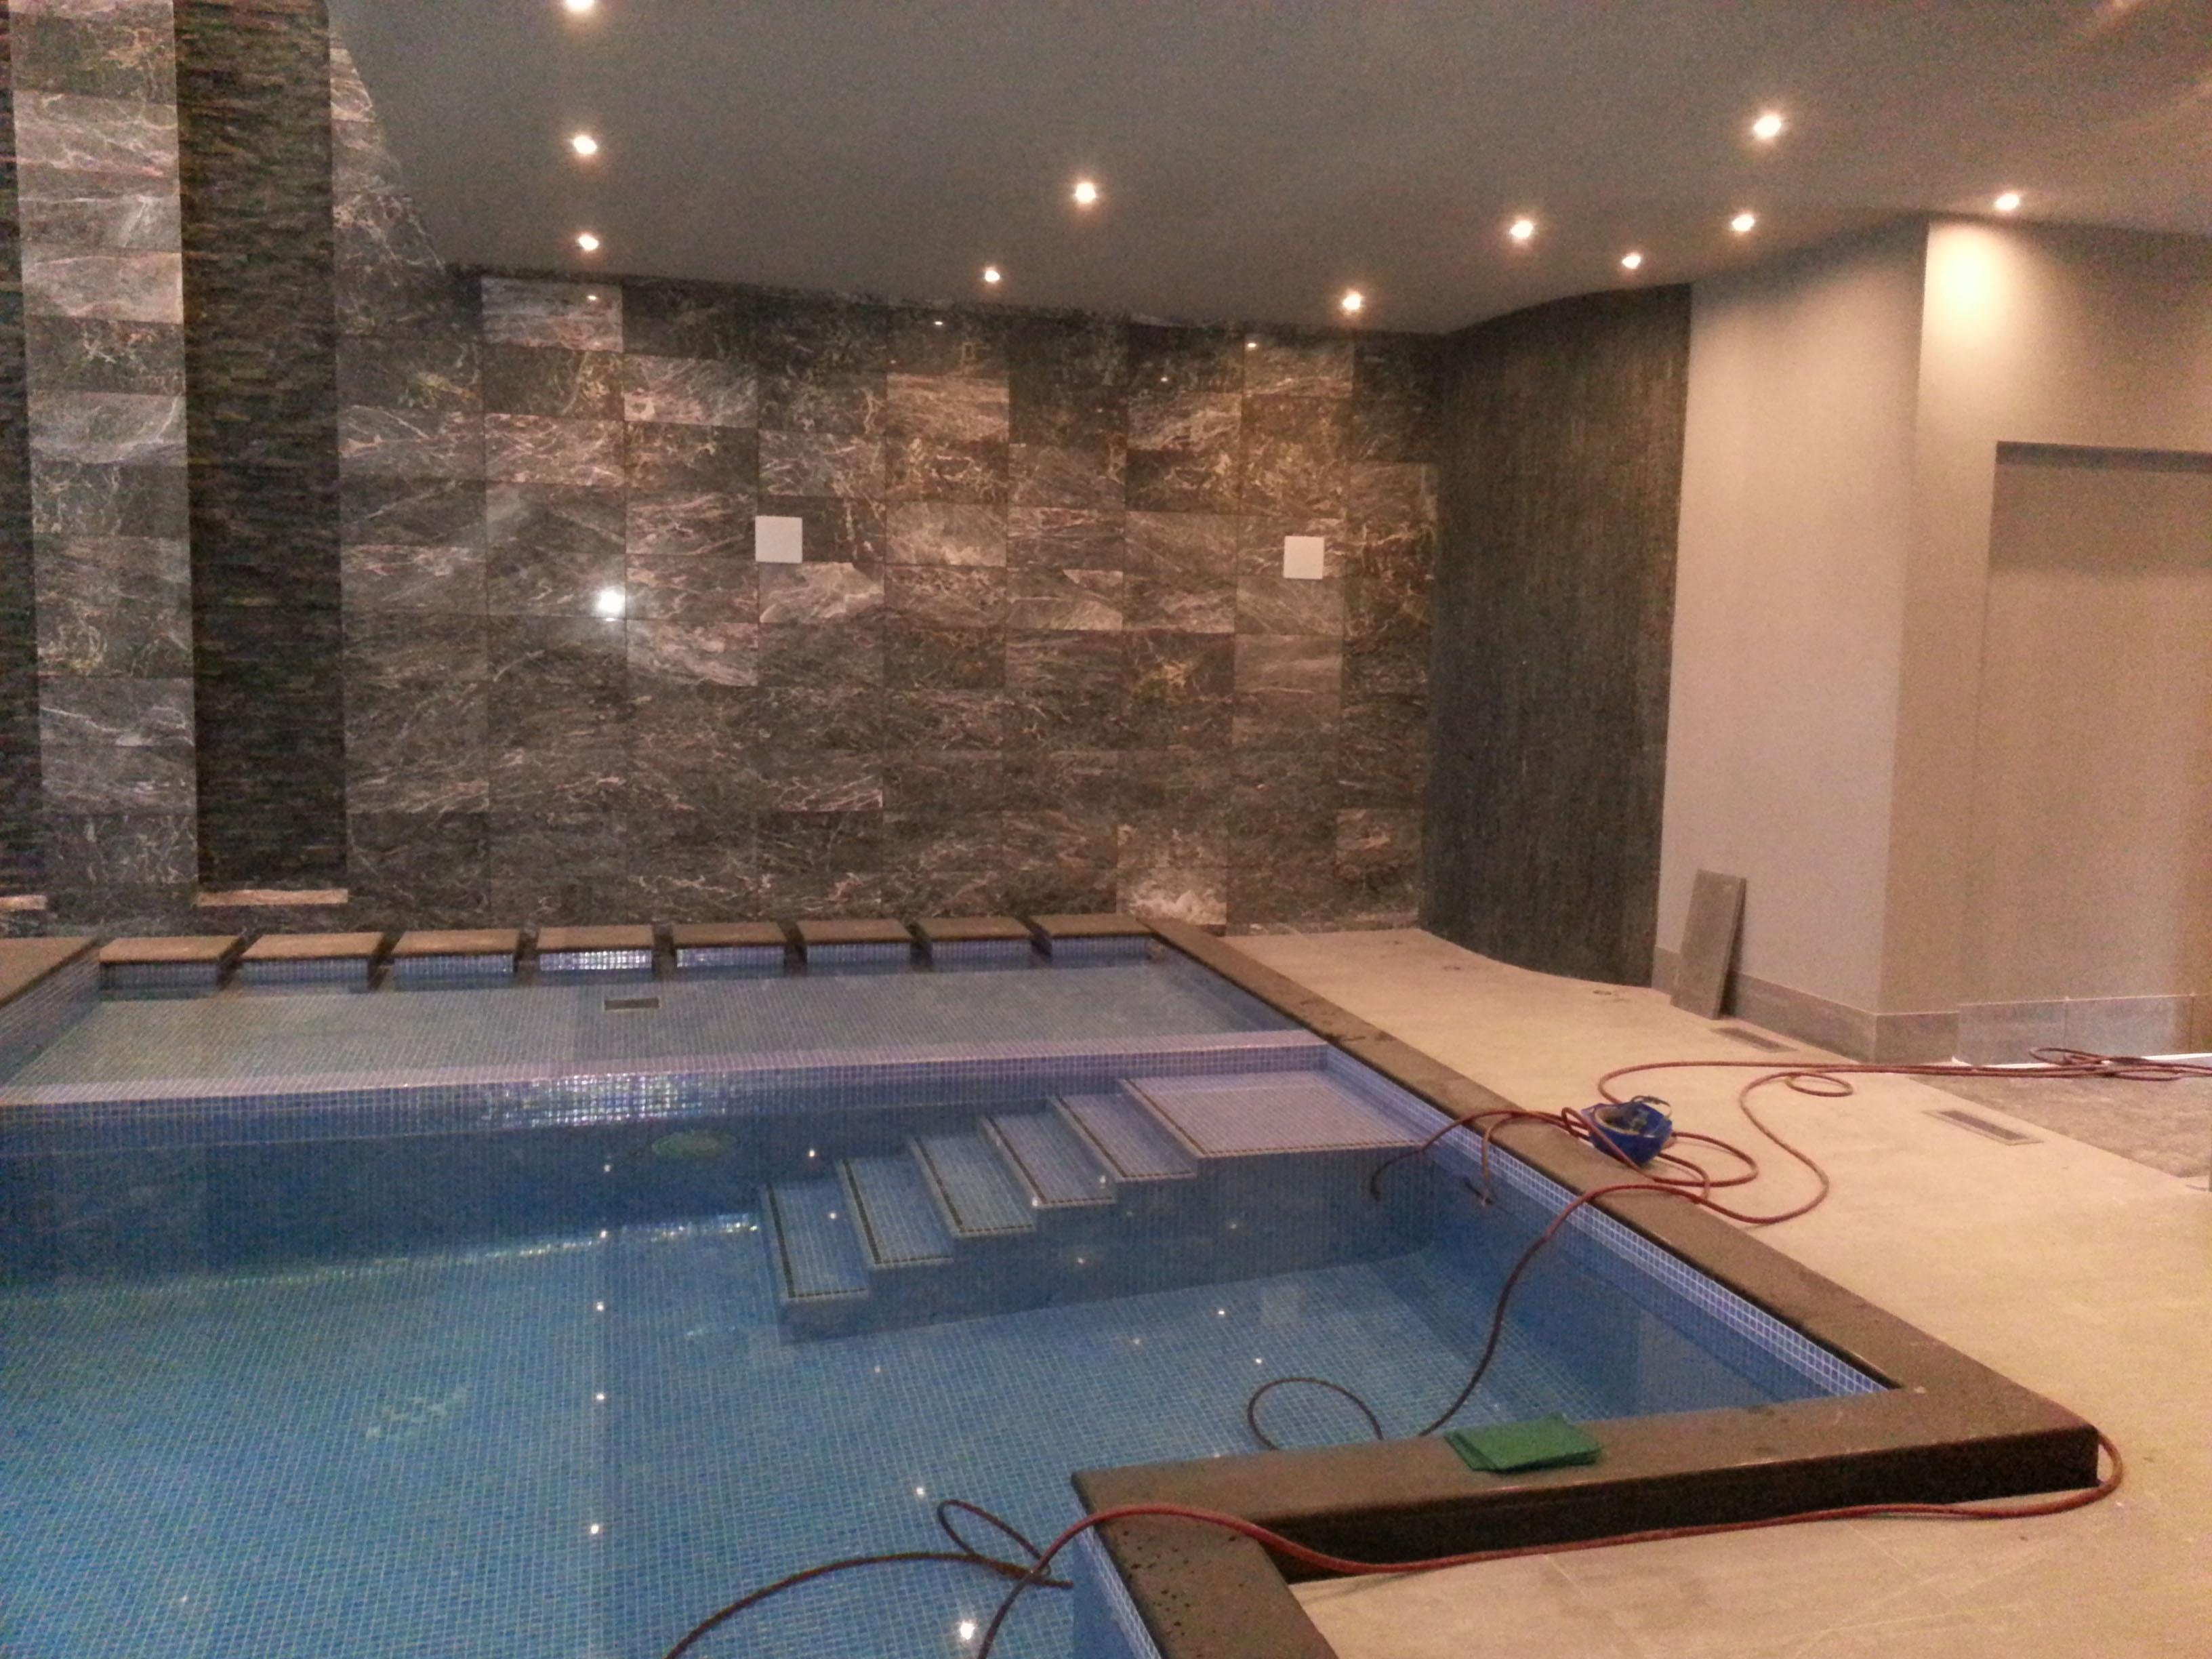 Large swimming pool jacuzzi installation - B Williams Electrical Ltd